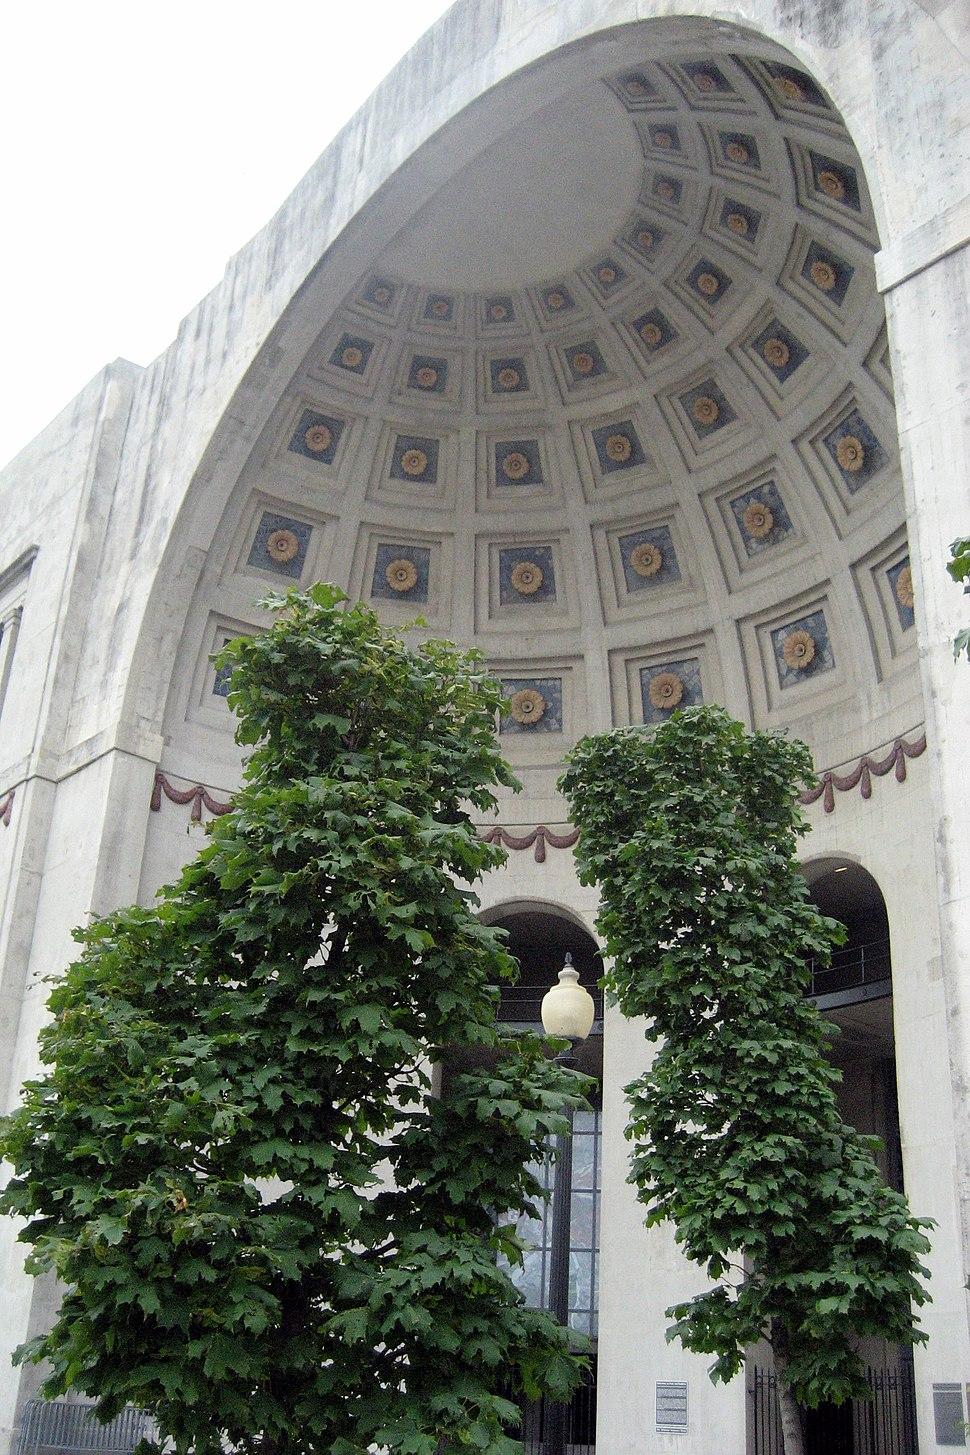 Ohio Stadium rotunda 2006